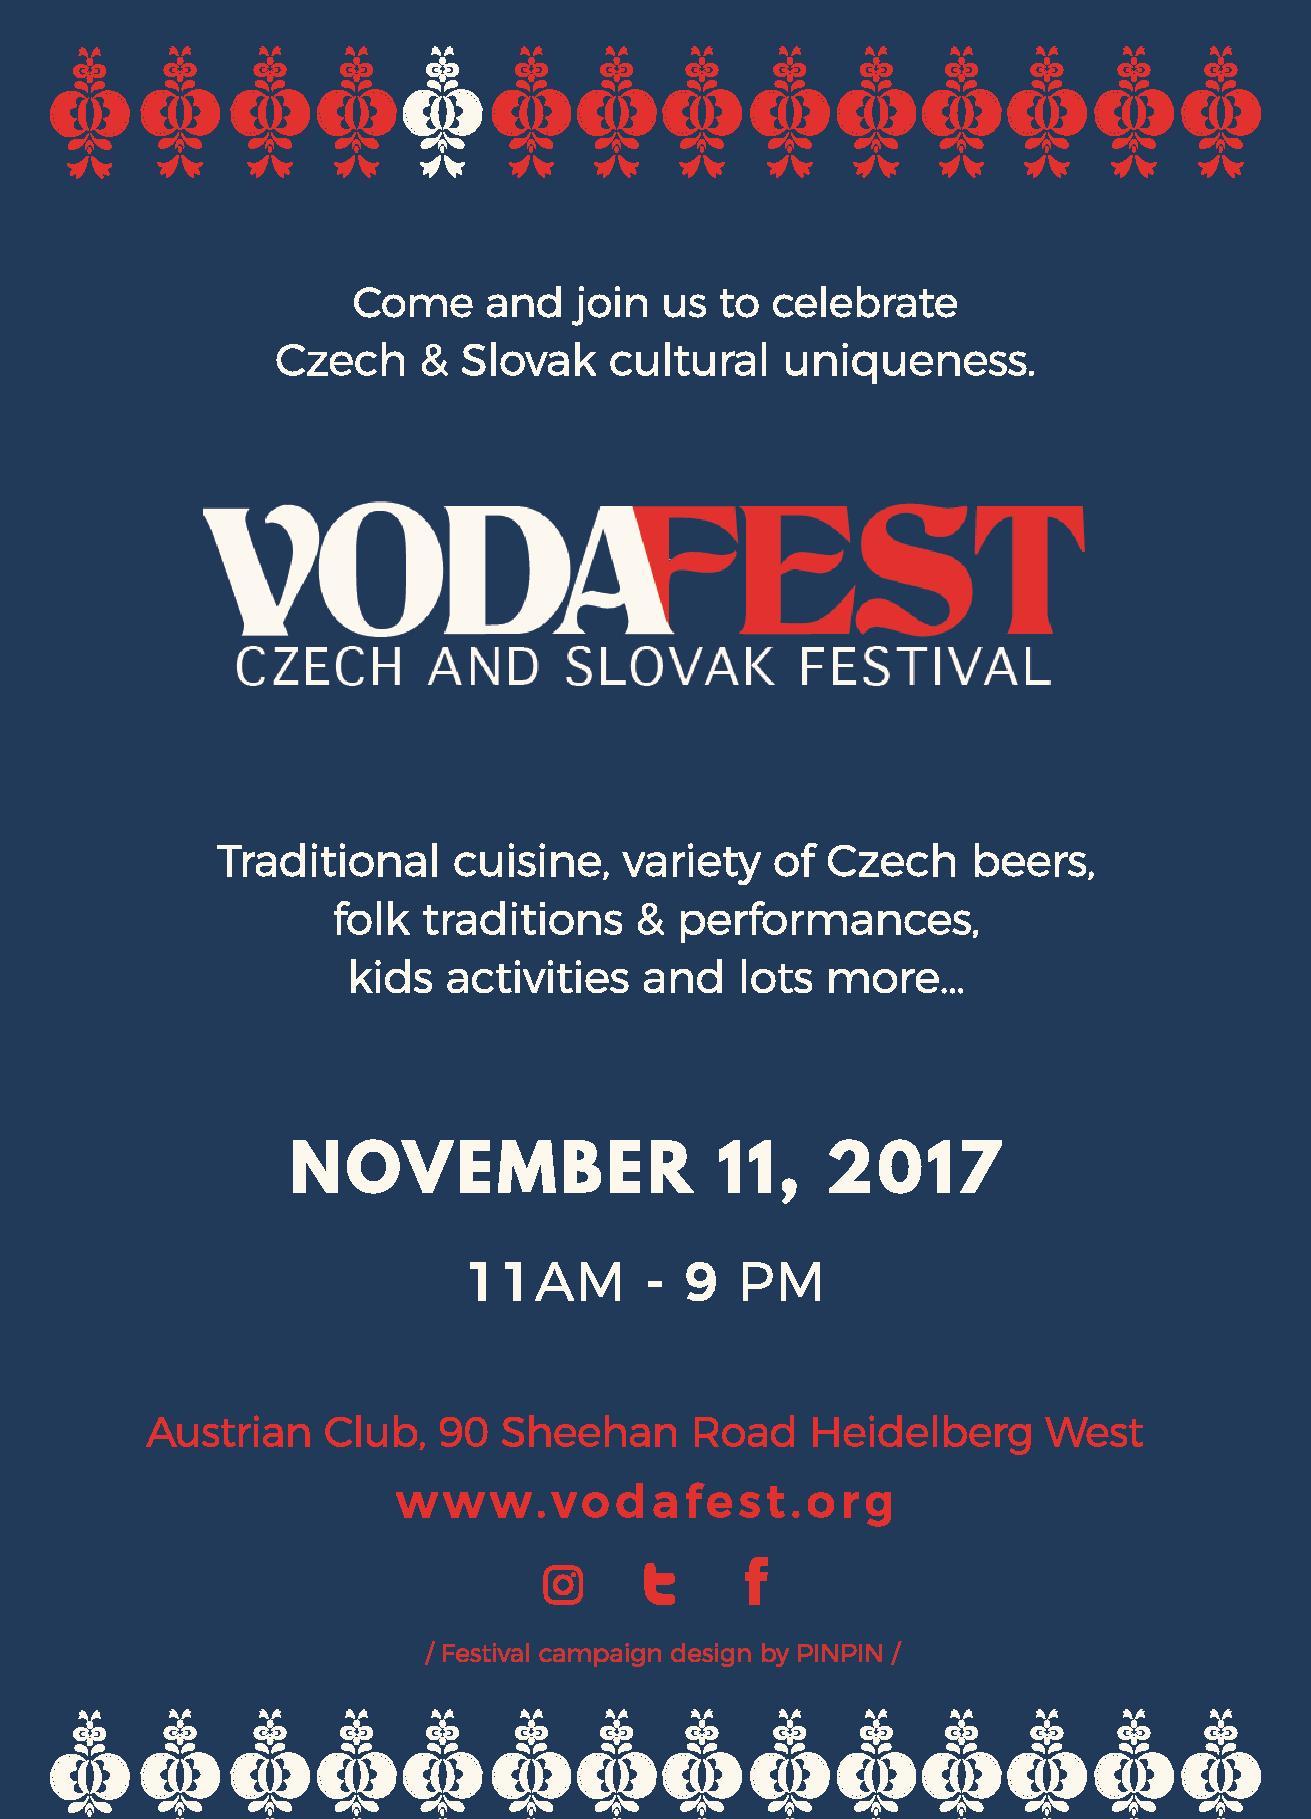 VodaFest Czech & Slovak Festival 2017